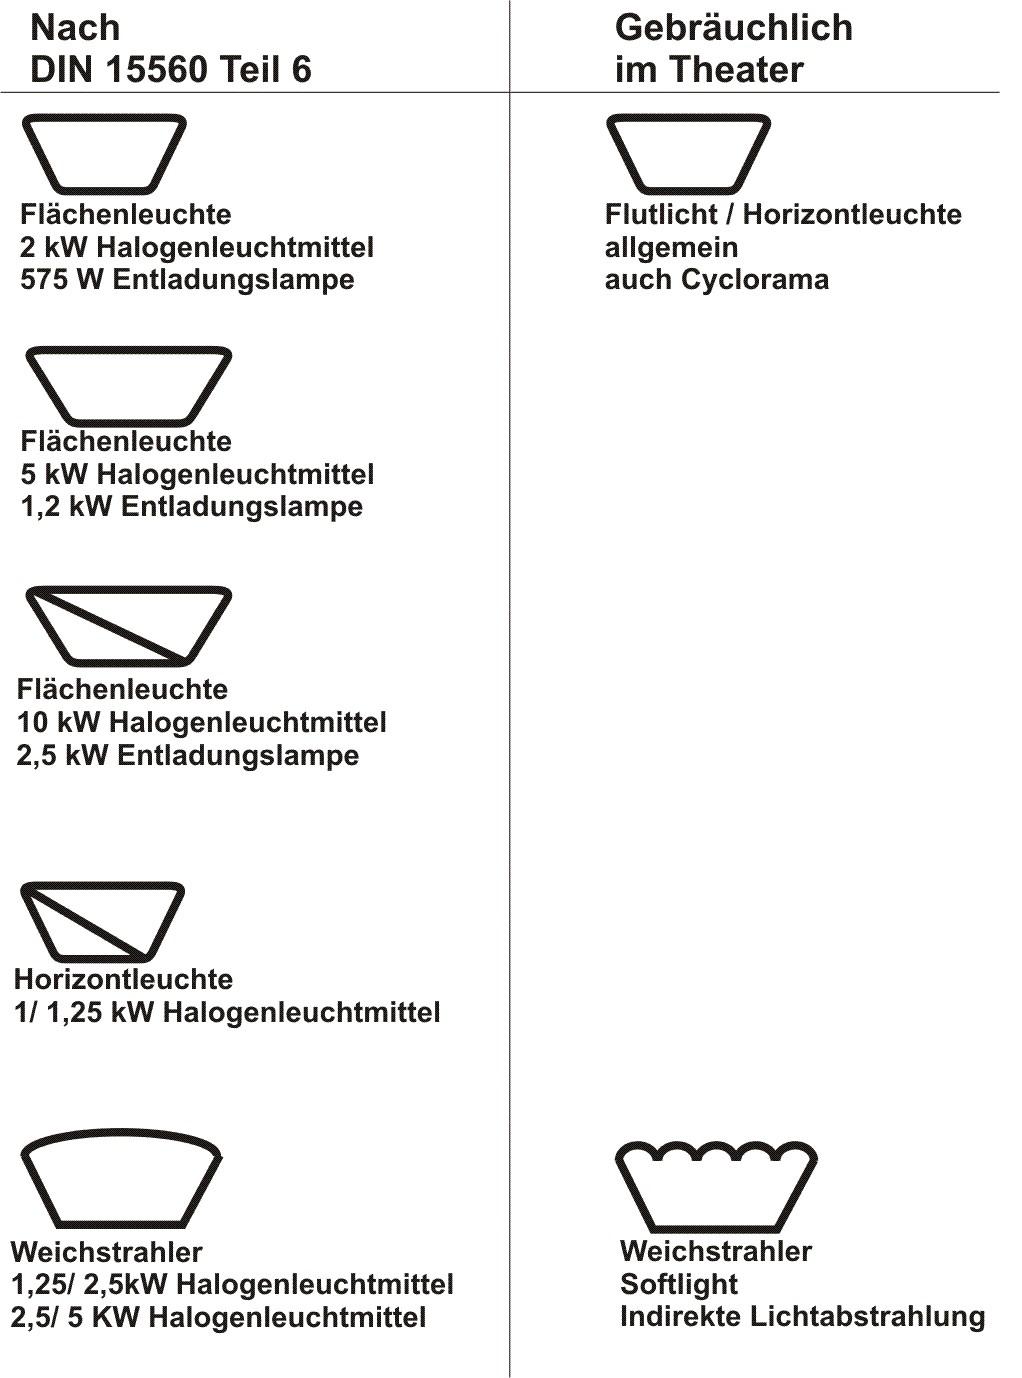 Symbole für Fluter